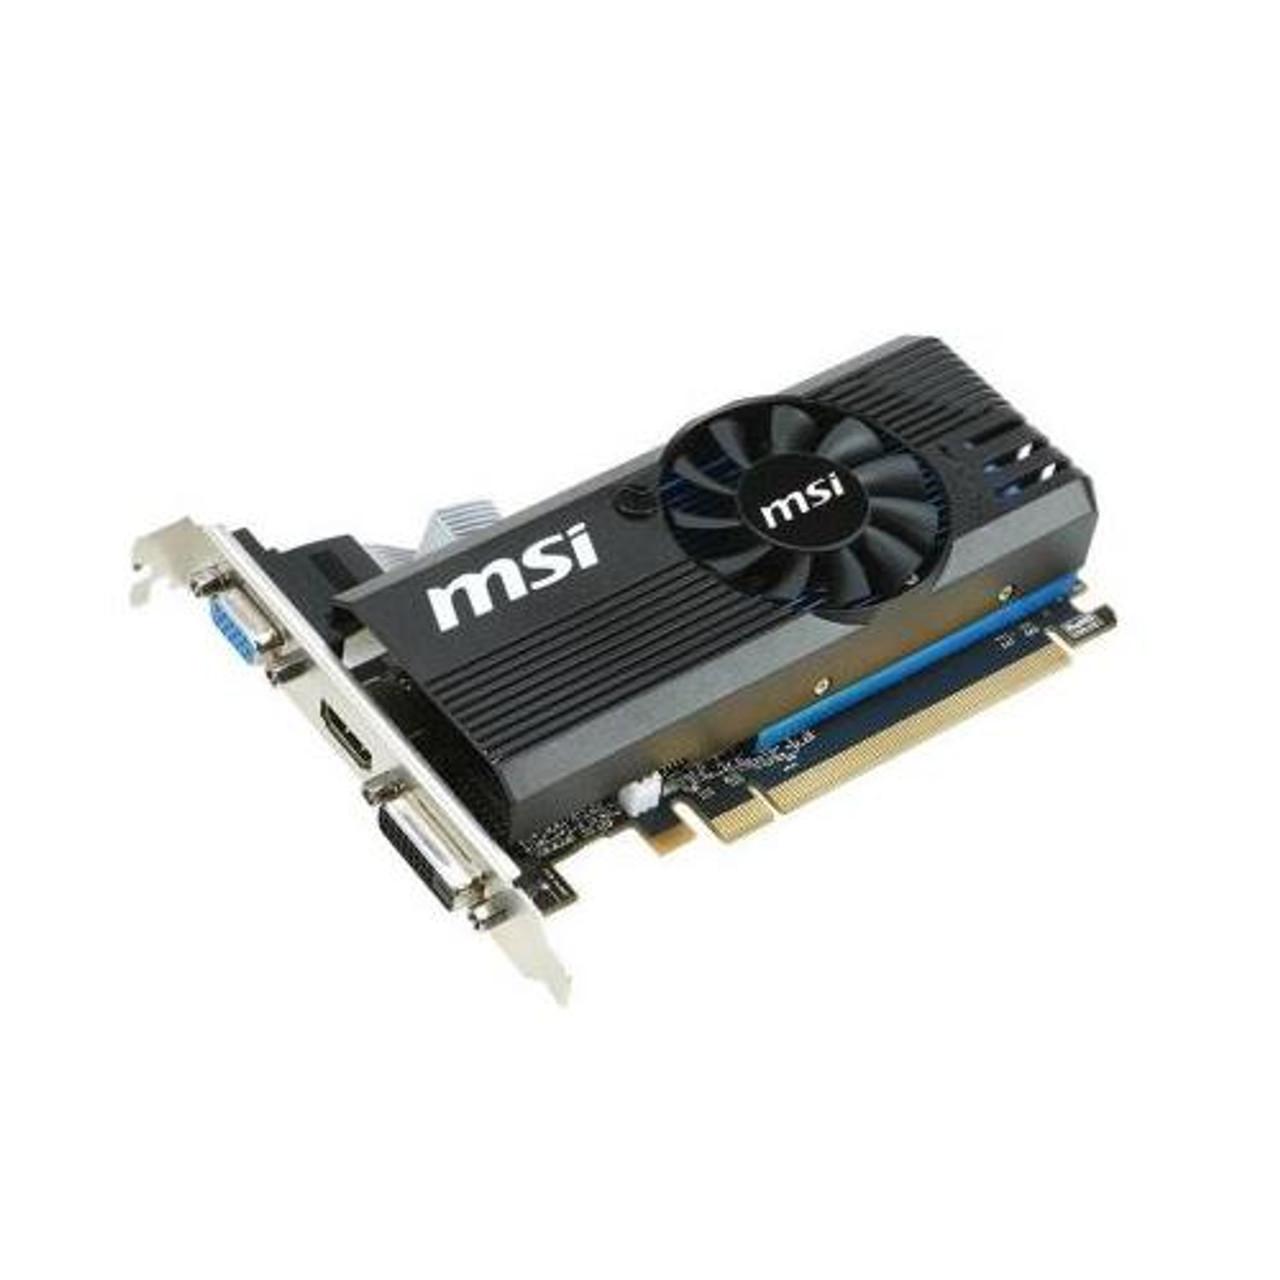 MSI-730G25 MSI NVidia GeForce GT 730 2GB GDDR5 VGA/DVI/HDMI PCI Express Low  Profile Video Graphics Card